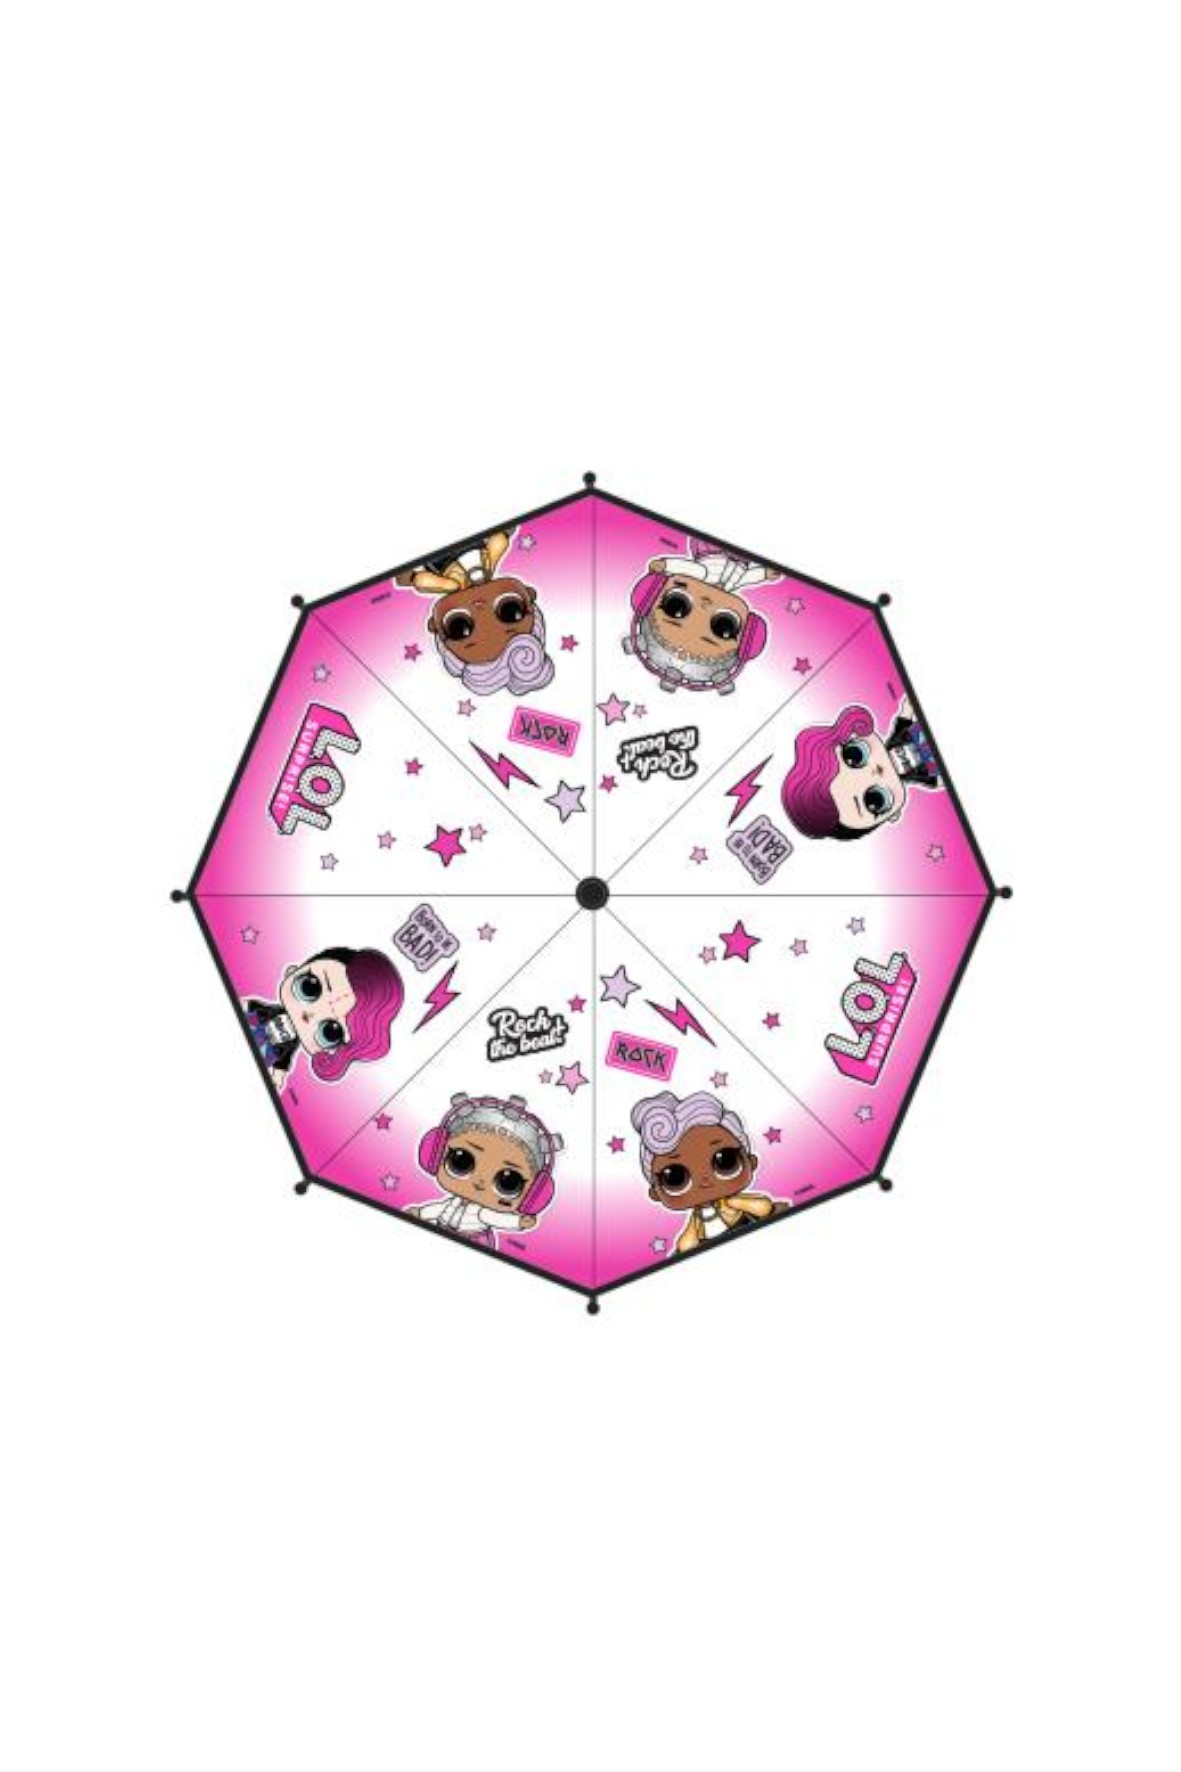 Parasolka dziewczęca L.O.L. Surprise różowa